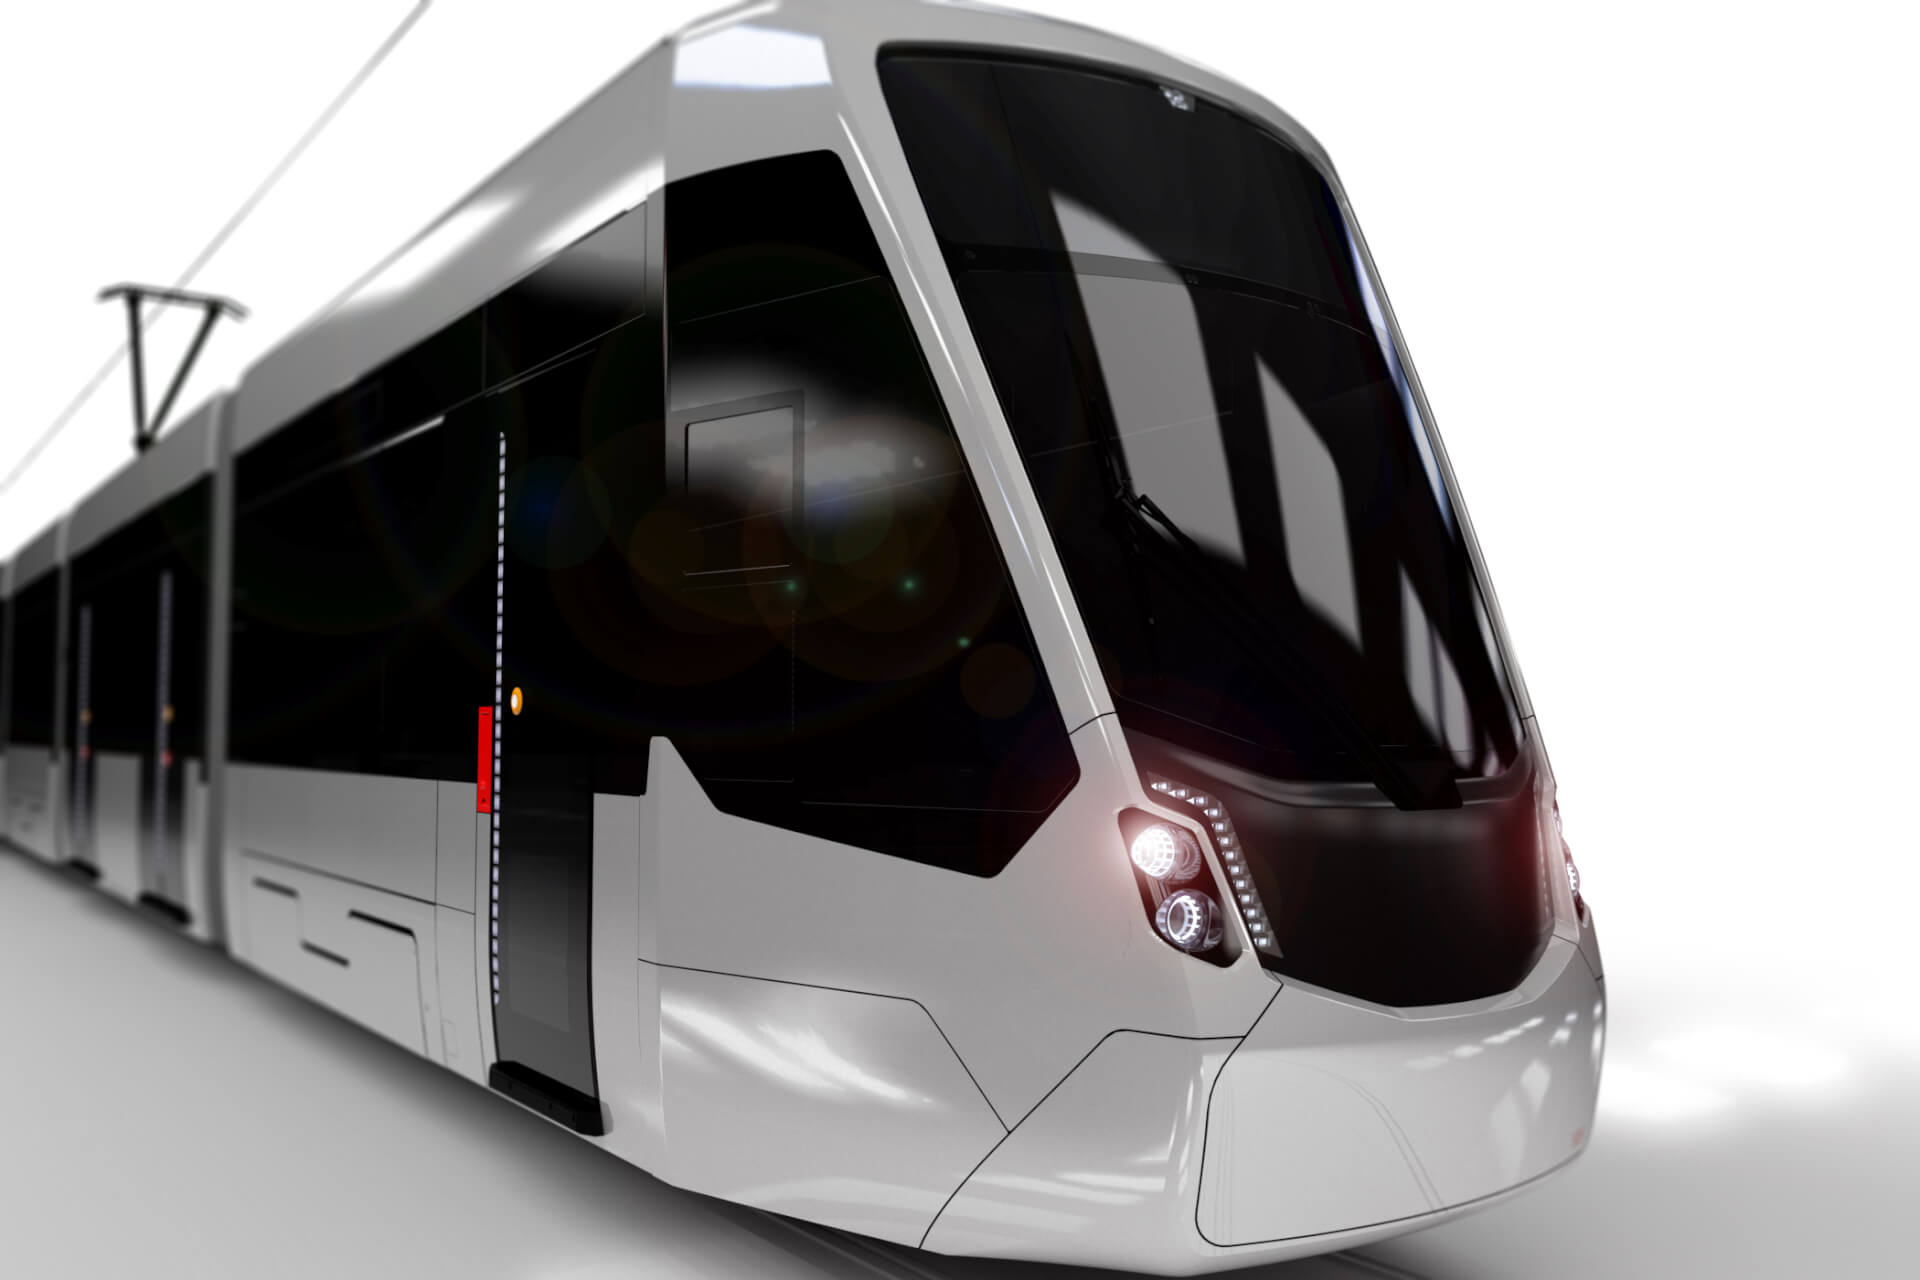 Tram Design Study, white rendering, detail, modern tram